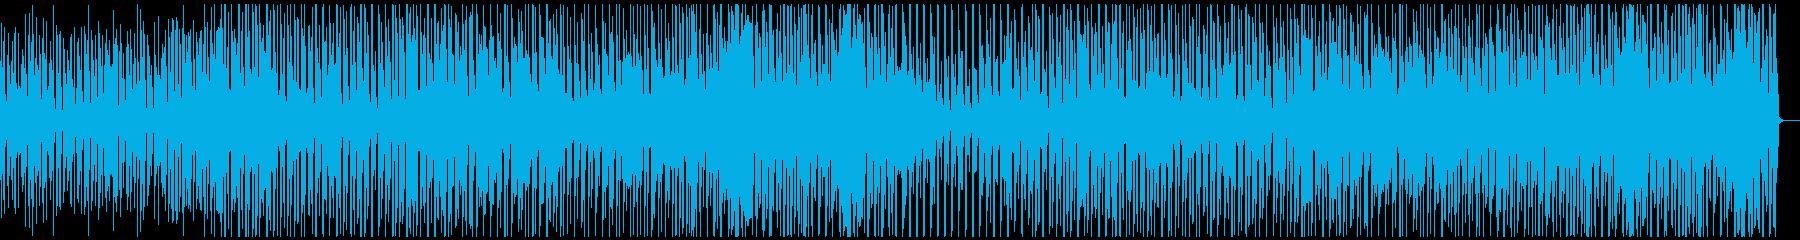 Anna Margheritaの再生済みの波形